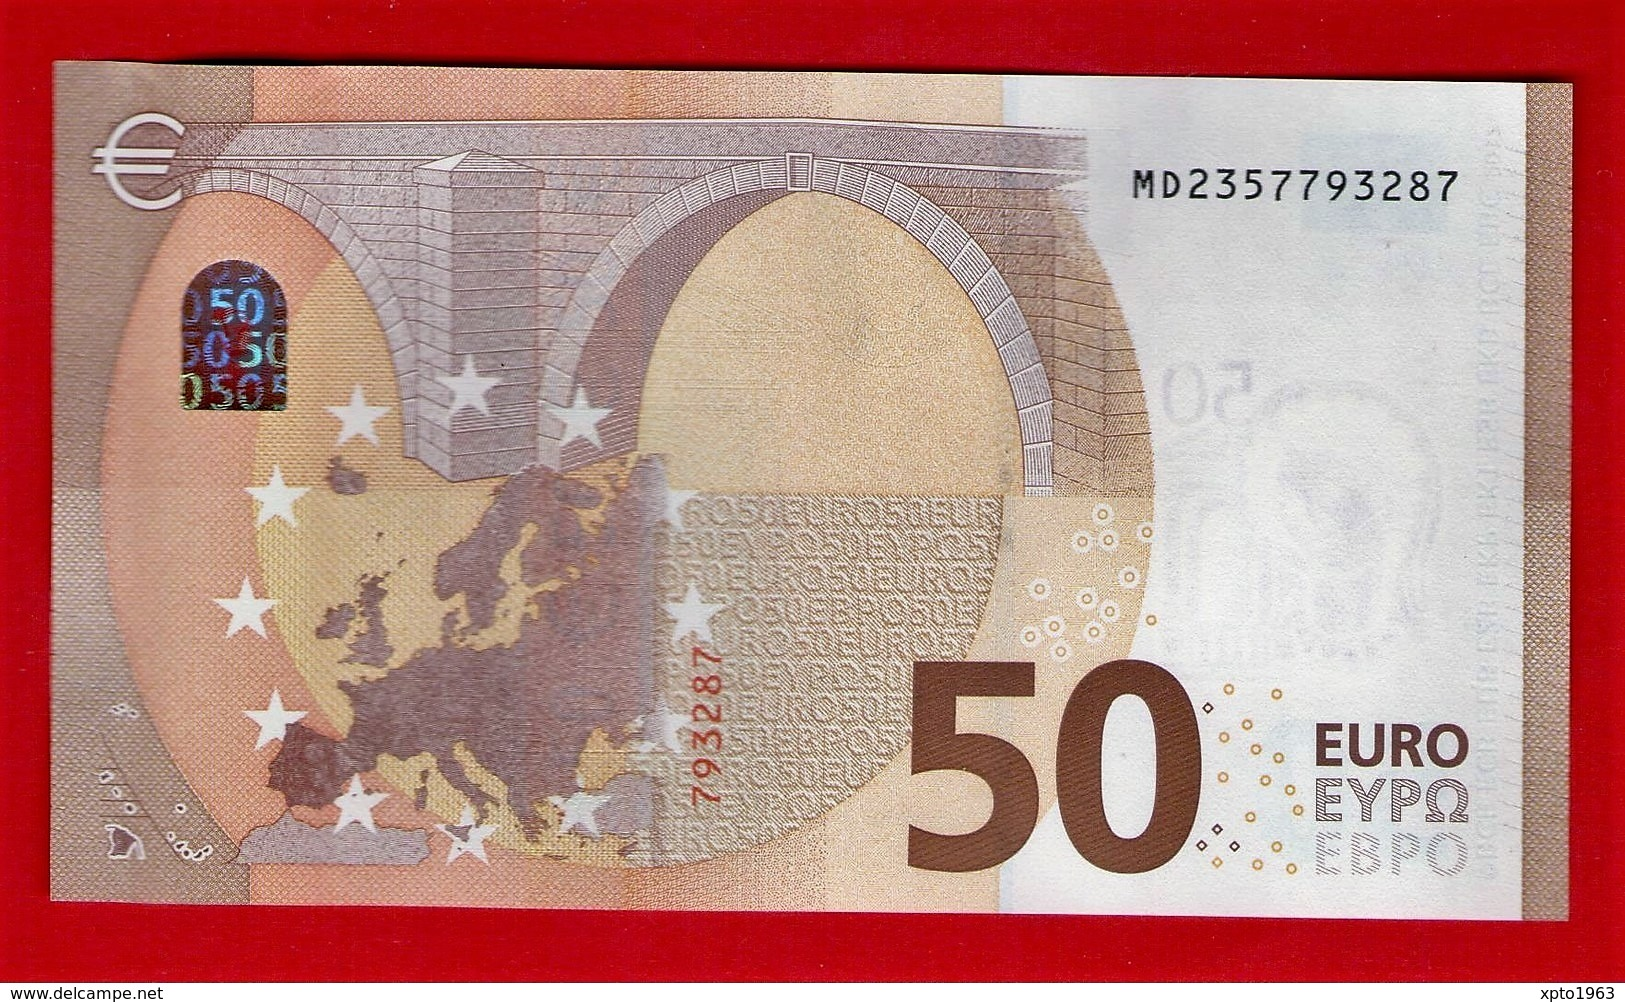 50 EURO PORTUGAL M008 F1 - MD2357793287 - M008F1 - UNC FDS NEUF - EURO